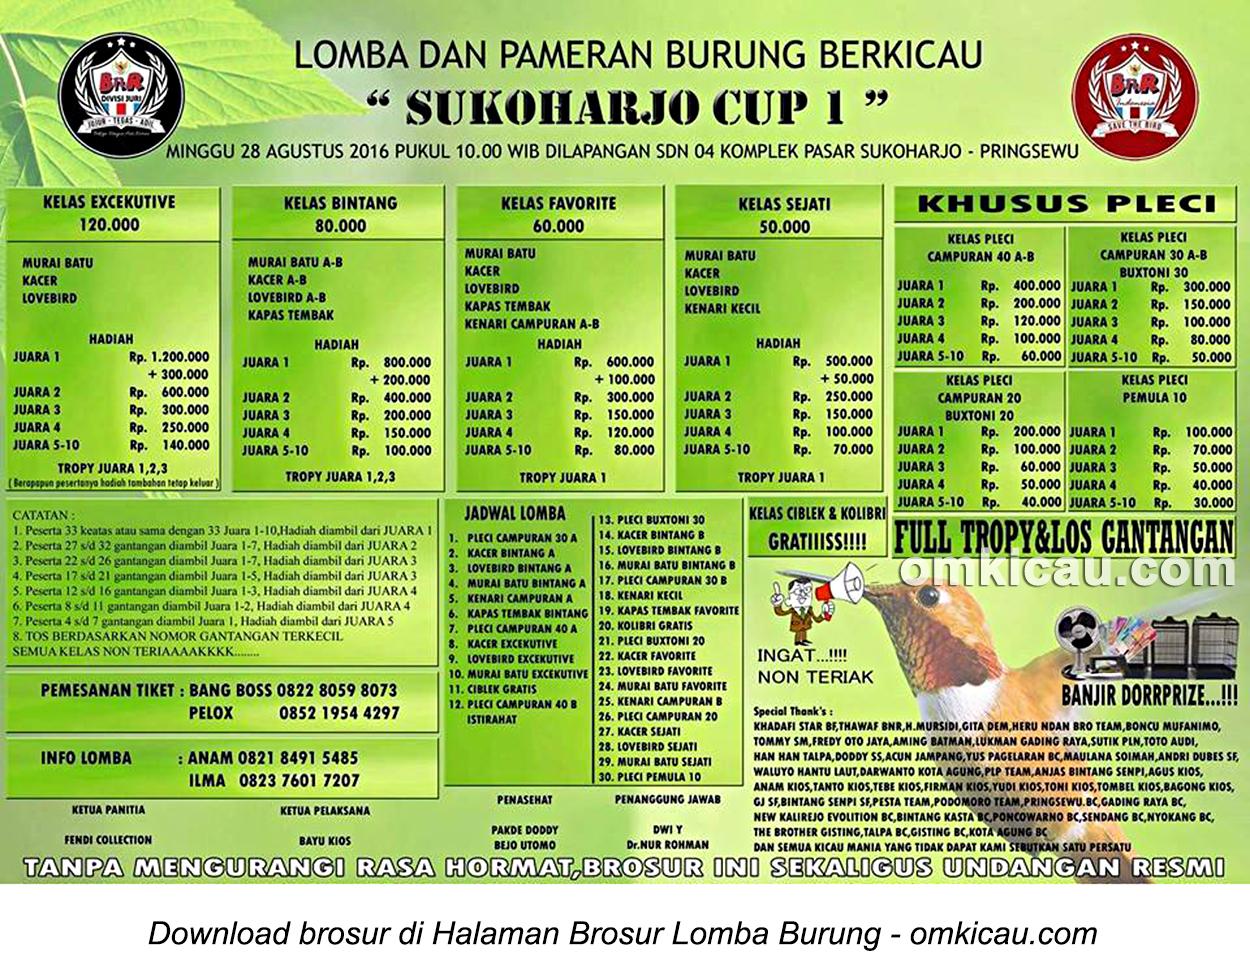 Brosur Lomba Burung Berkicau Sukoharjo Cup I, Pringsewu, 28 Agustus 2016